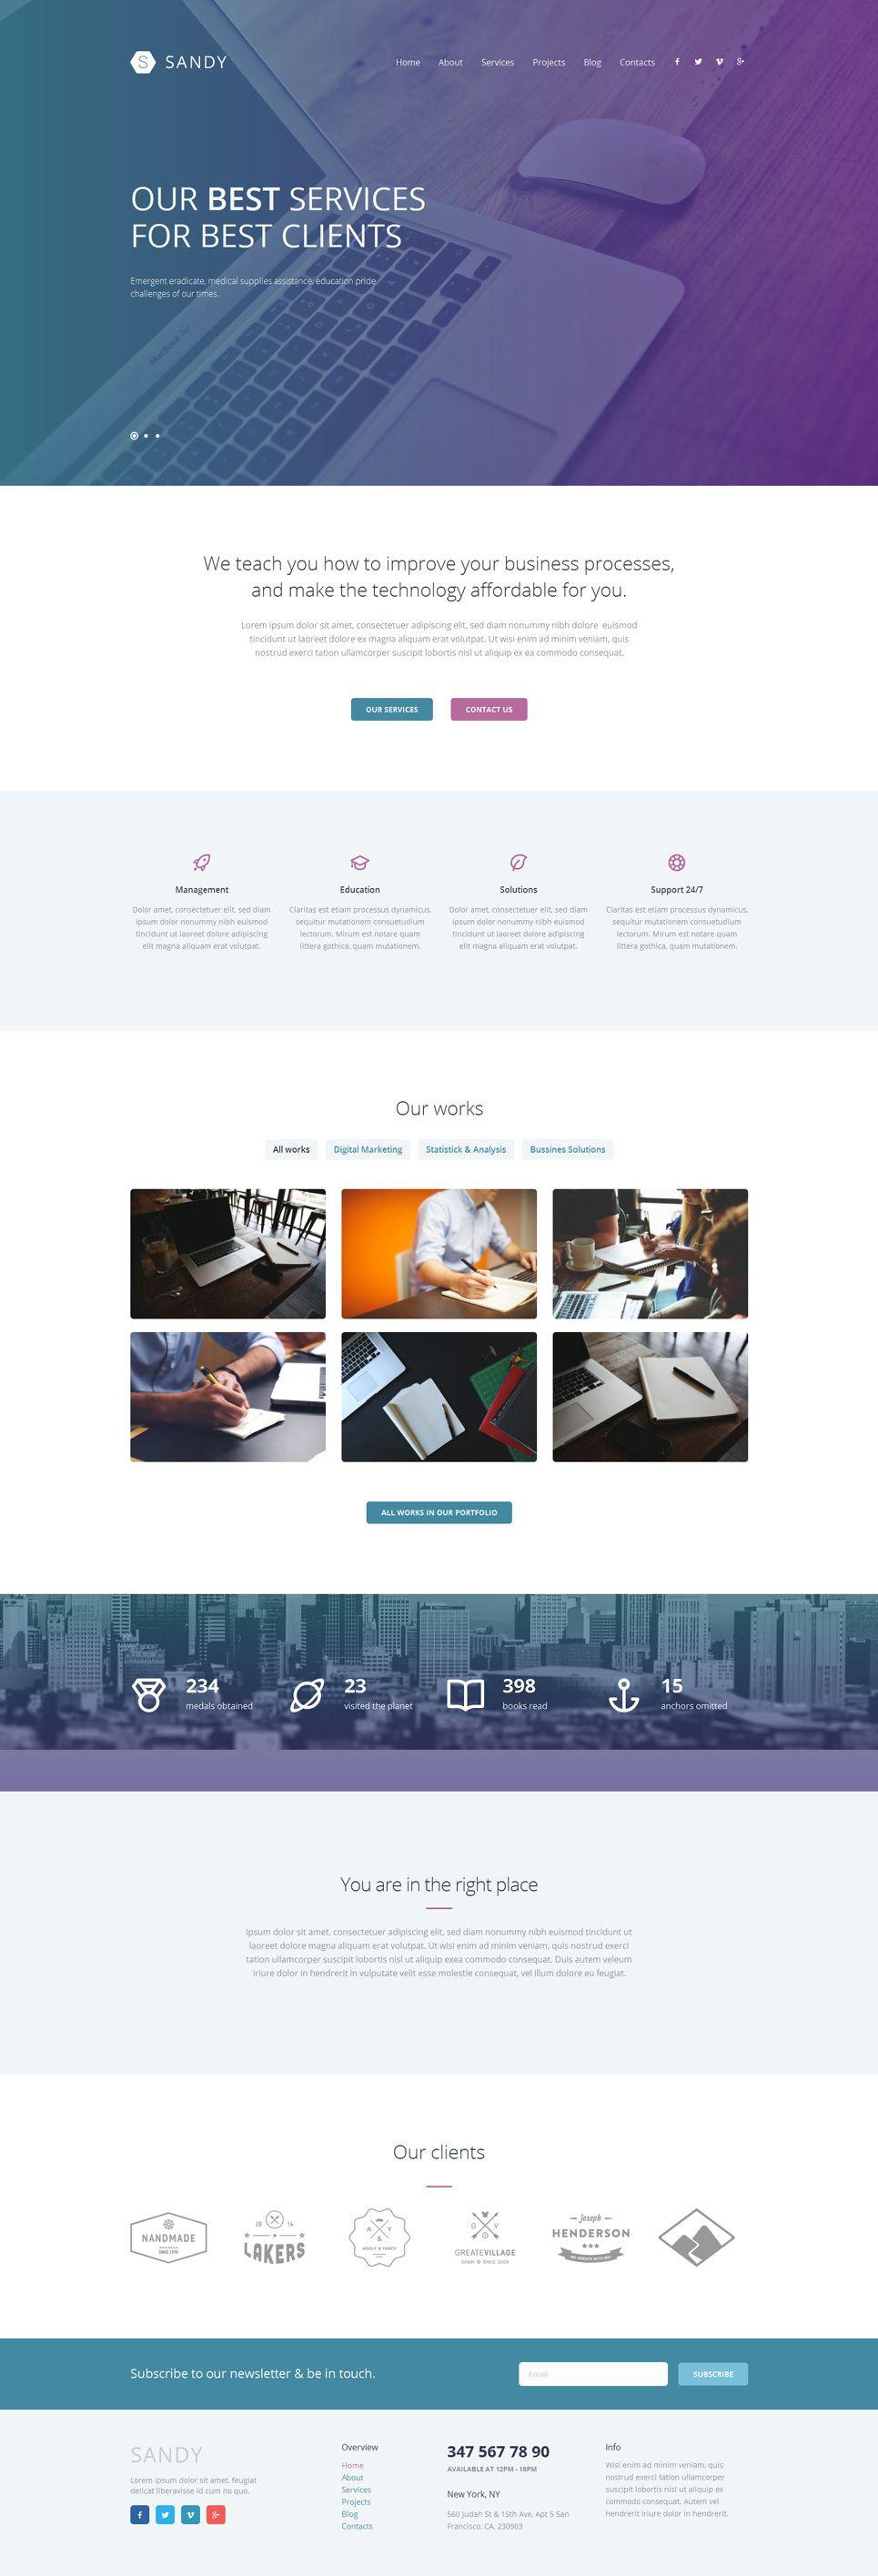 Sandy Web Design Website Template With Elementor Builder Wordpress Theme 52603 Web Design Tips Simple Web Design Website Design Inspiration